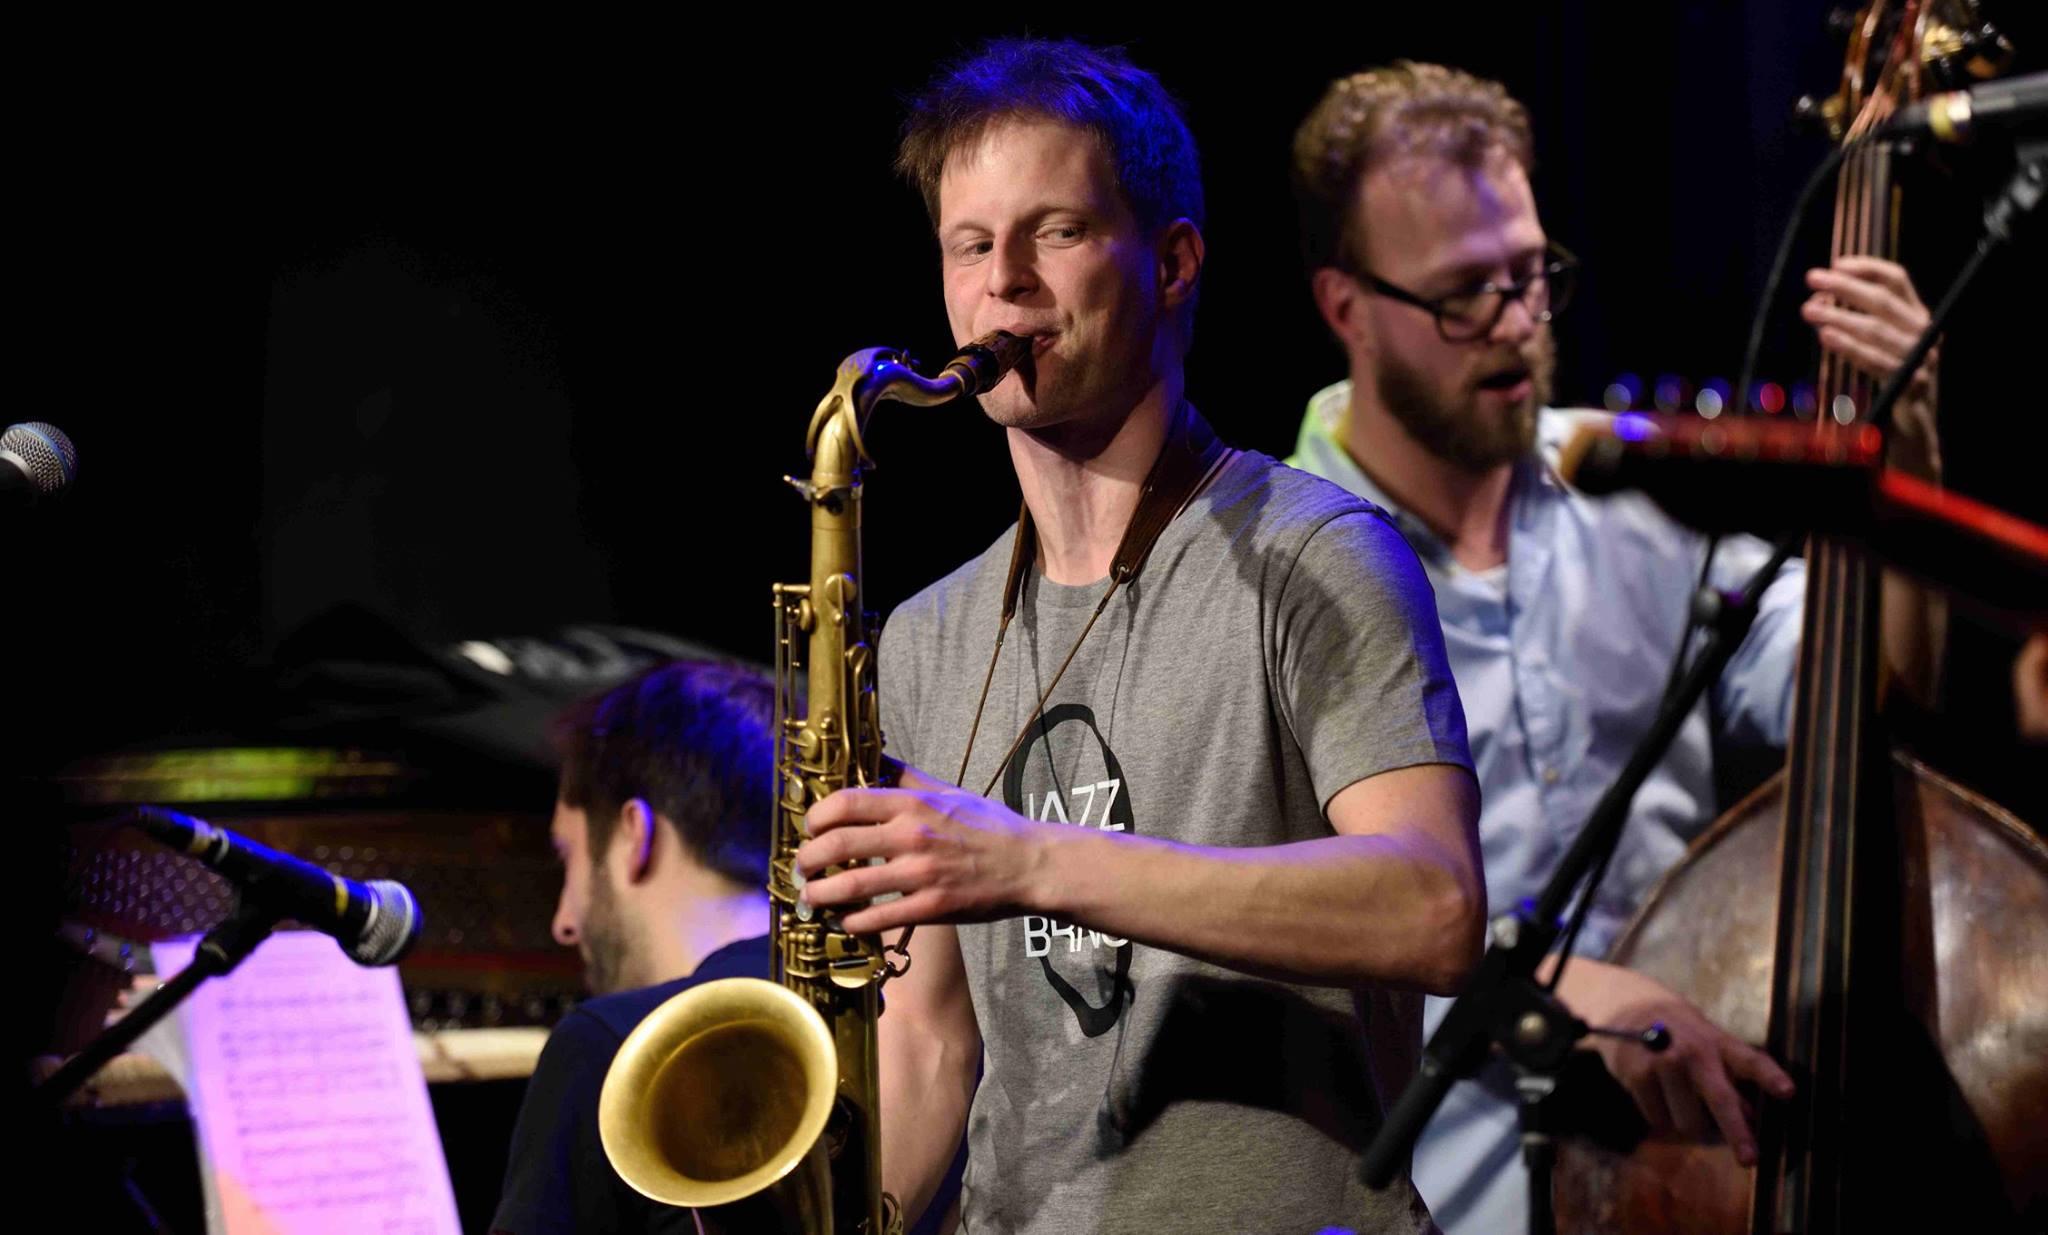 Lubos Soukup | Lubos-Soukup-Quartet-at-Giant-Steps-Svendborg-2017